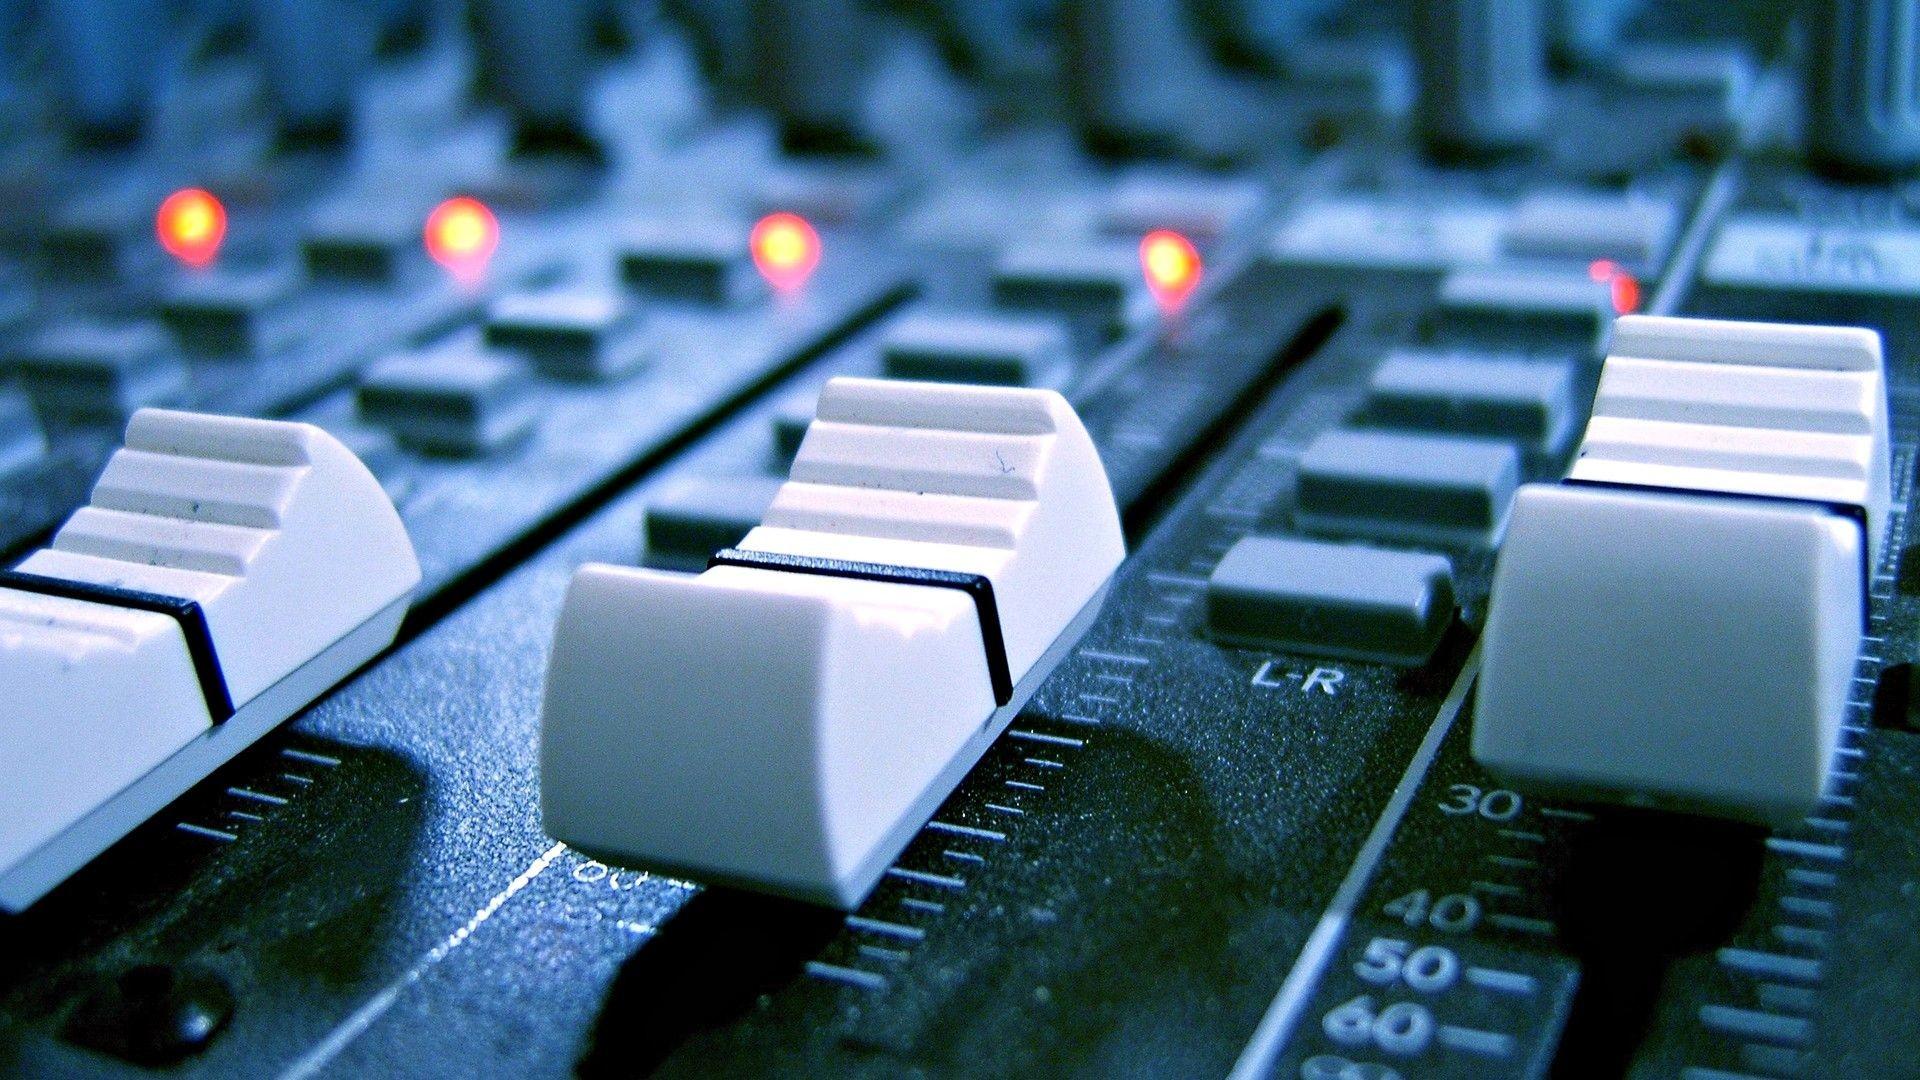 Dj spin sound effect free download mp3